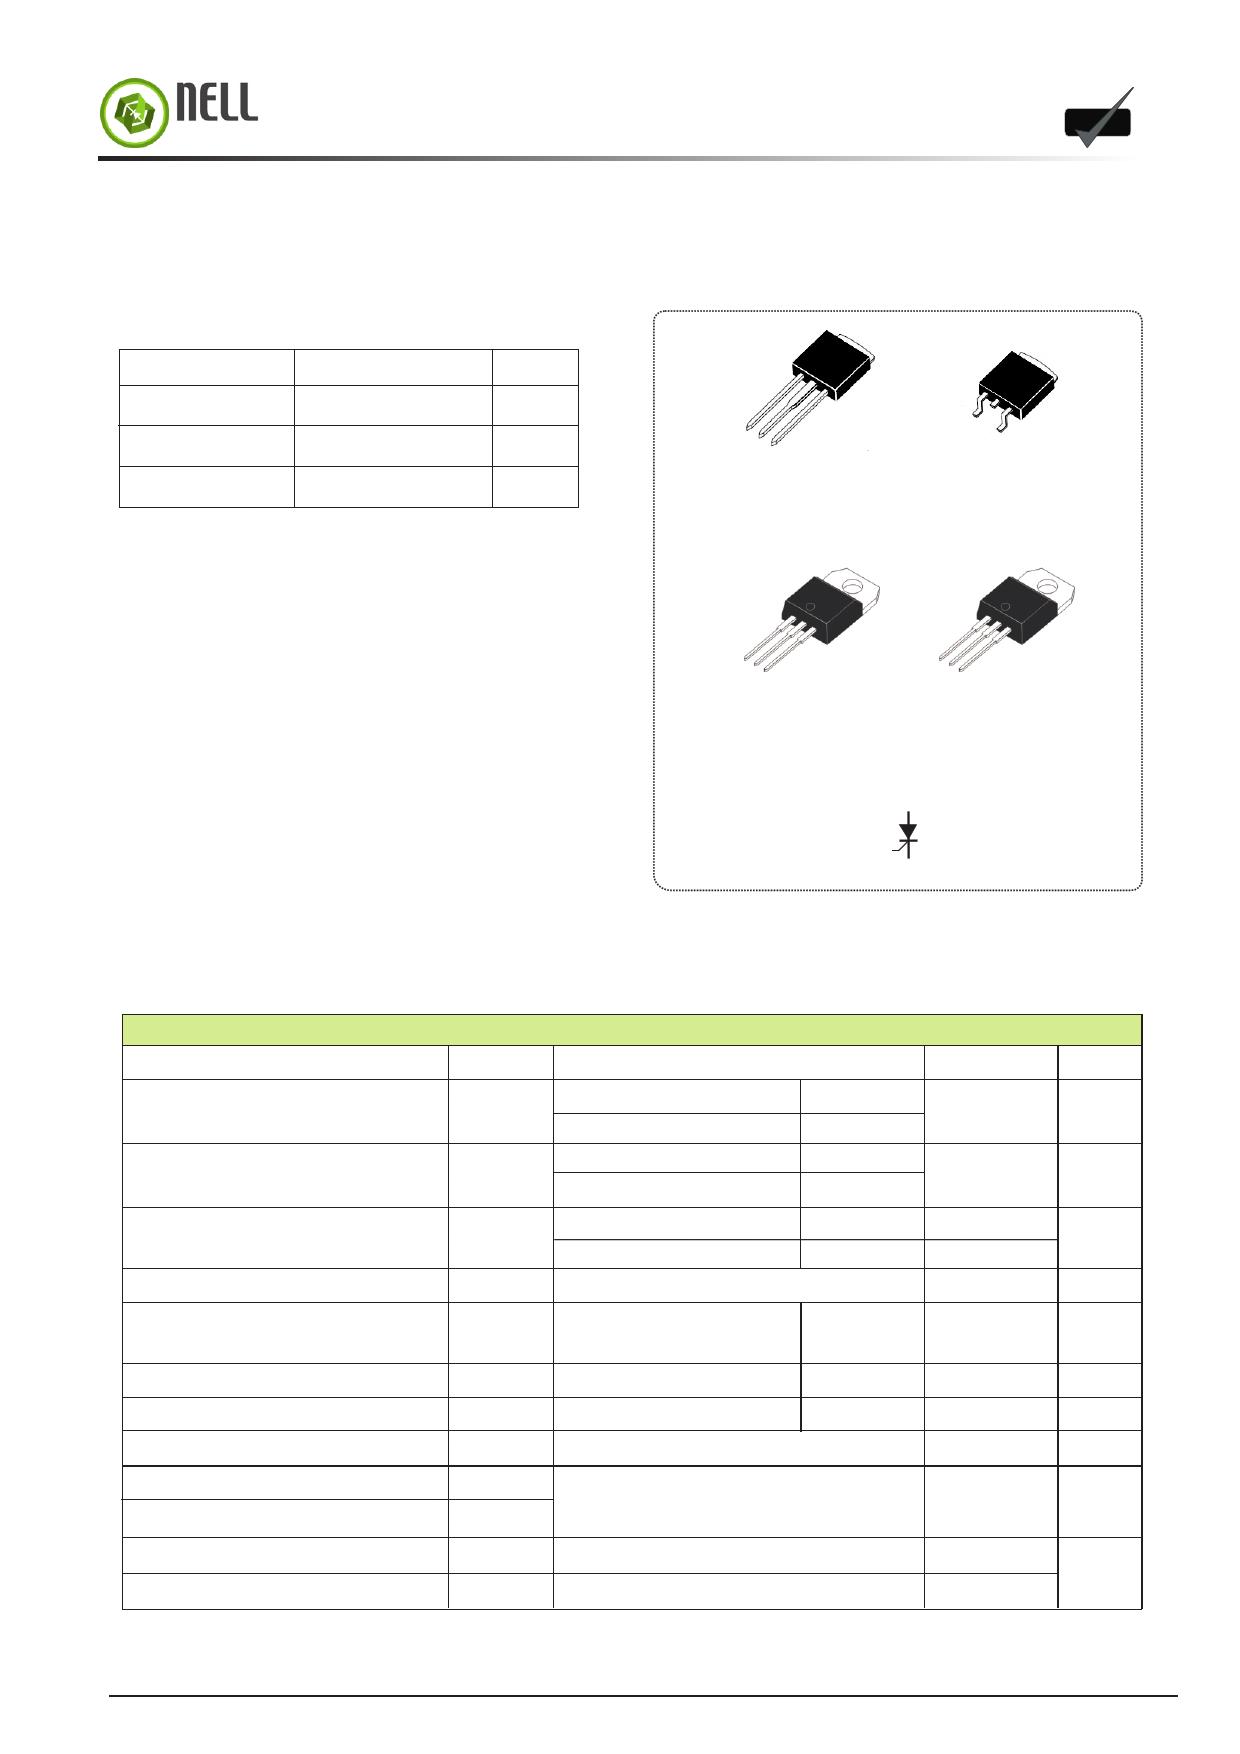 6PT Datasheet